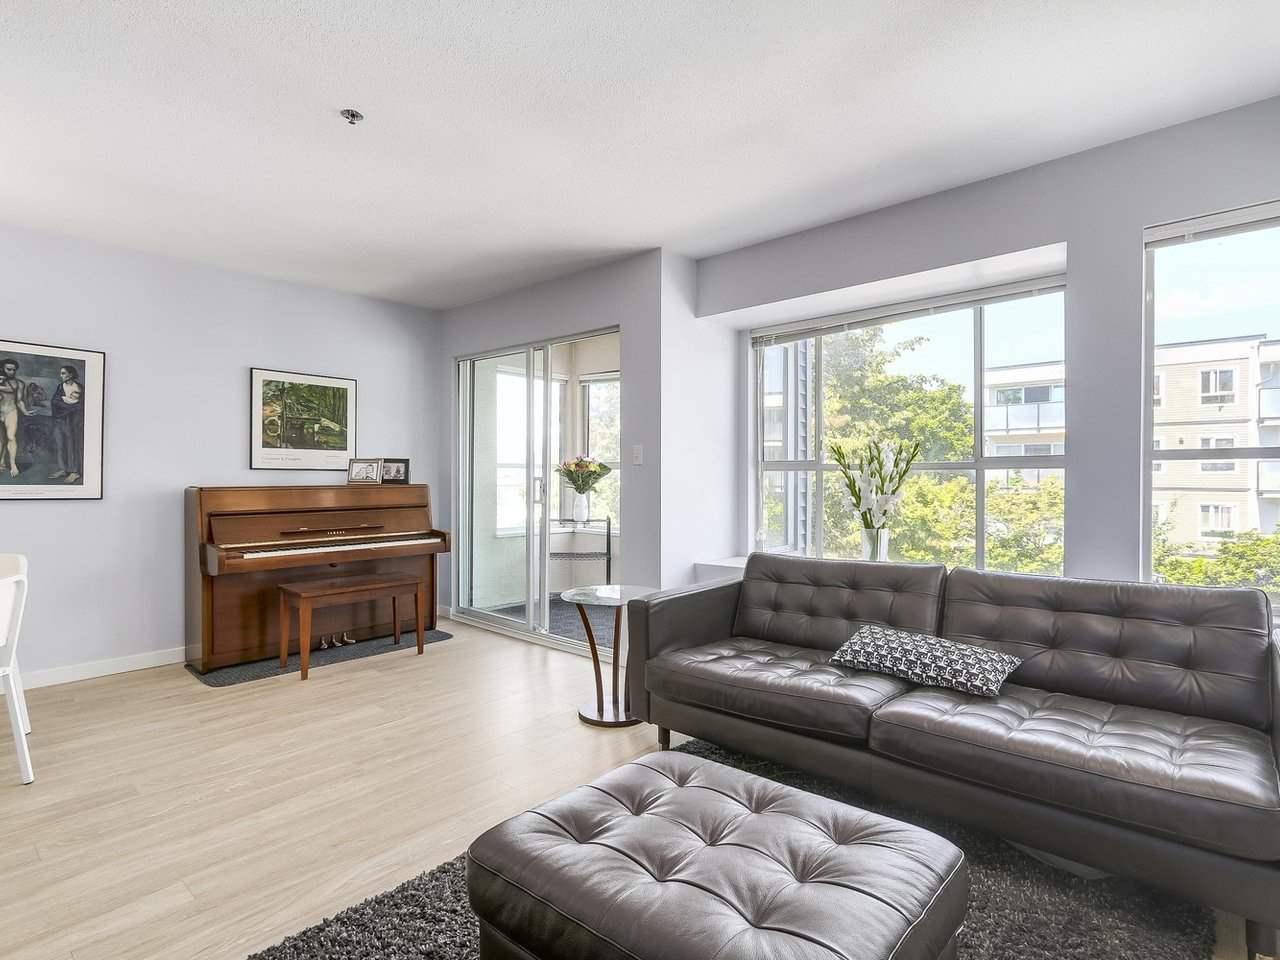 Condo Apartment at 301 120 GARDEN DRIVE, Unit 301, Vancouver East, British Columbia. Image 3